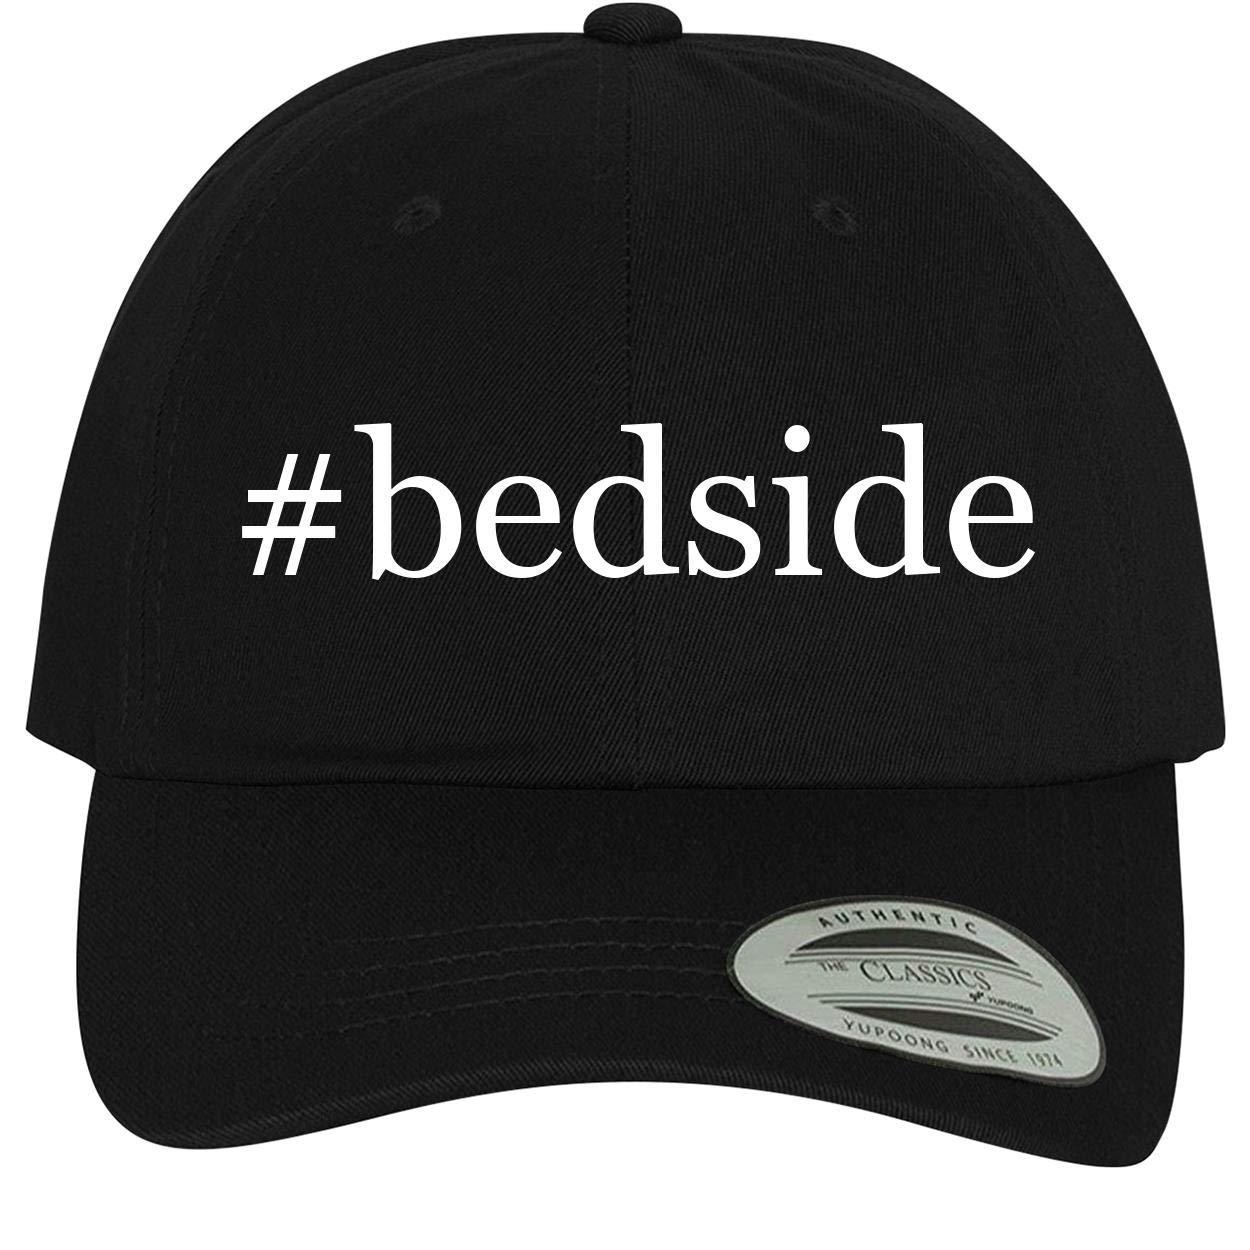 Comfortable Dad Hat Baseball Cap BH Cool Designs #Bedside